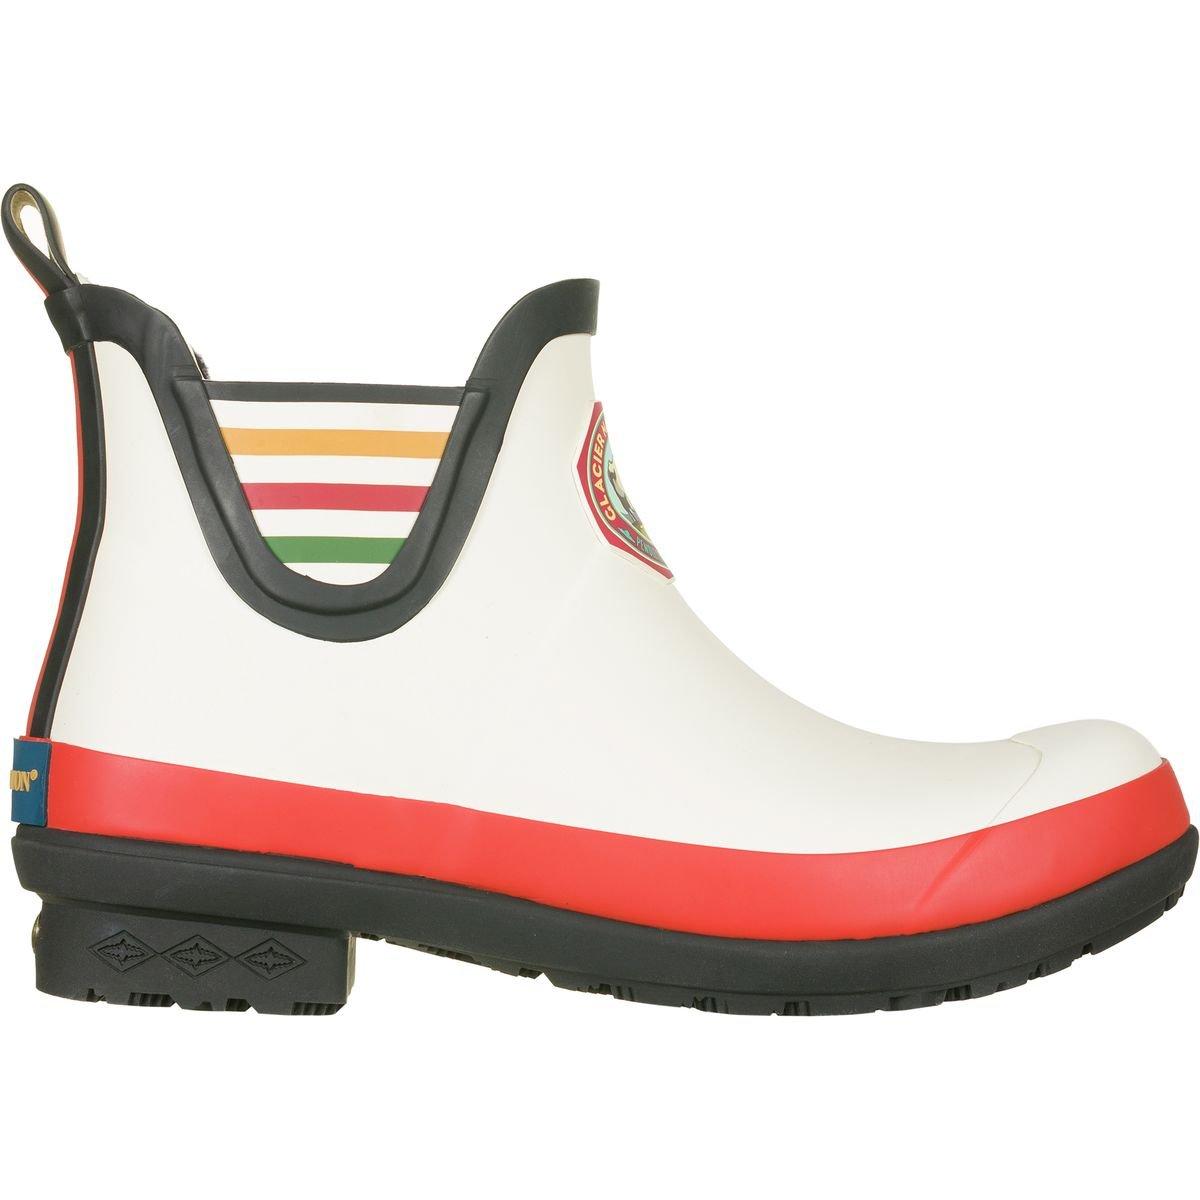 Pendleton Women's Heritage Acadia National Park Chelsea Boot B07772T736 10 B(M) US|Glacier/White